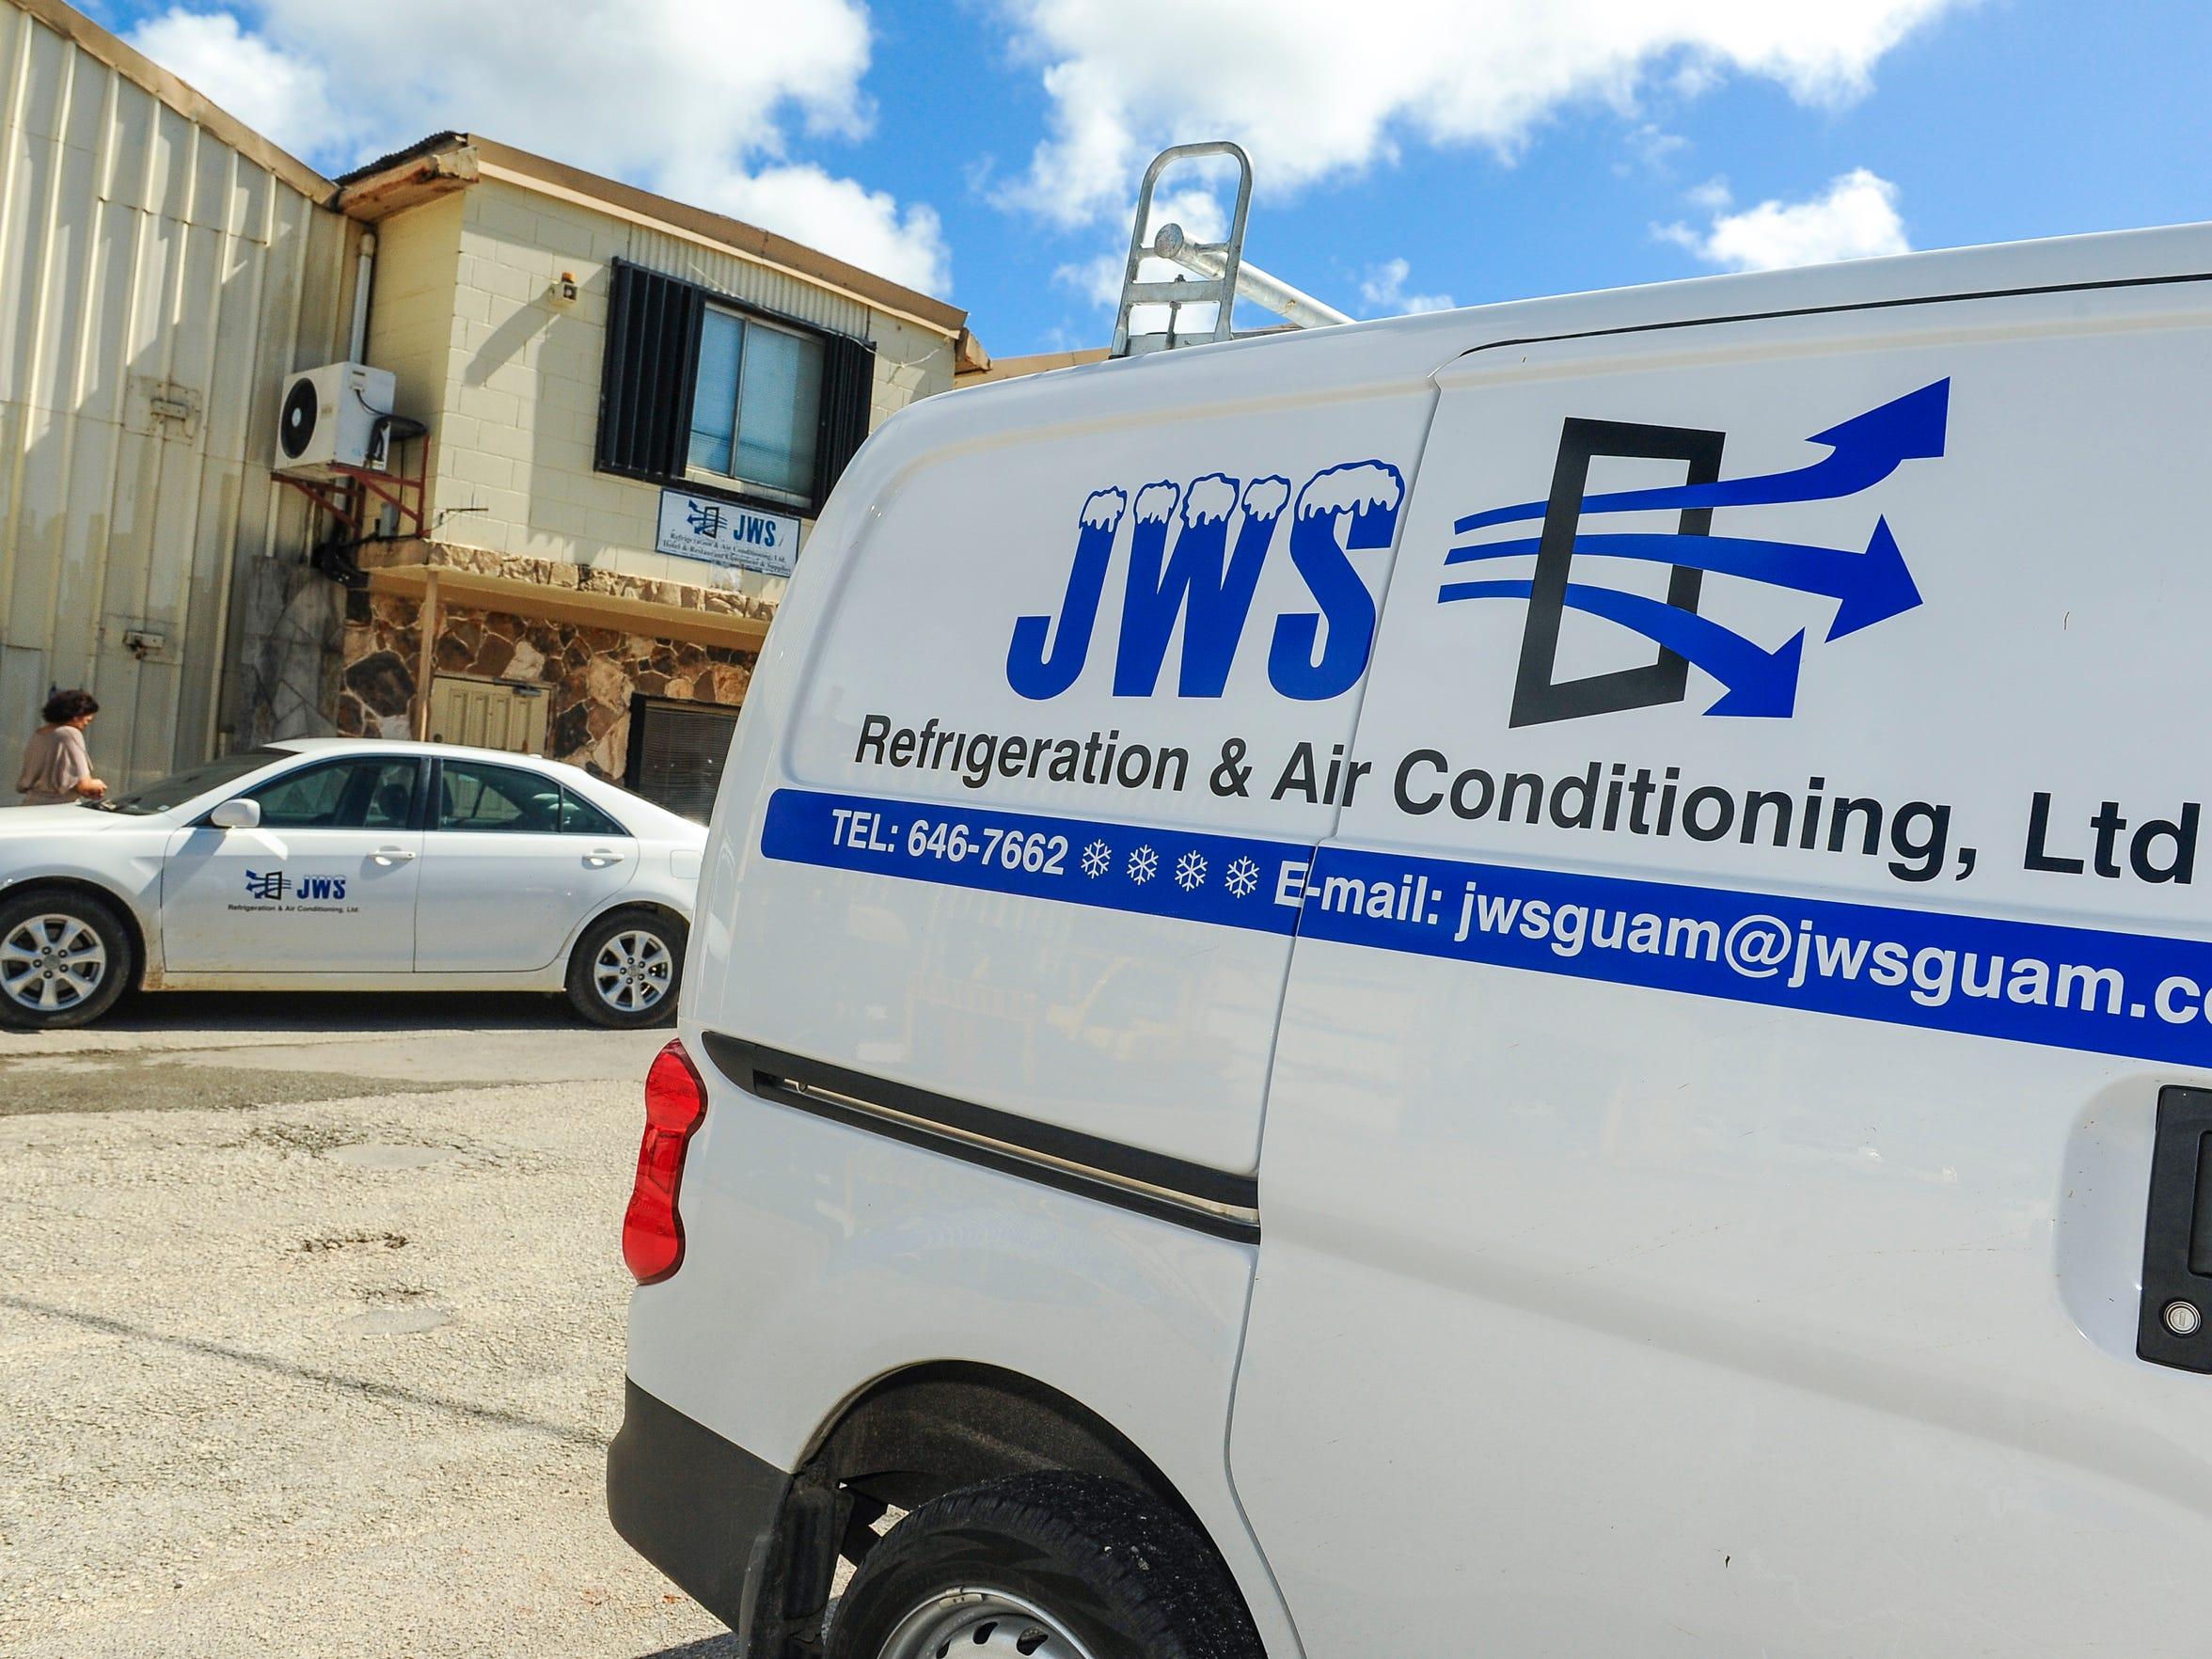 JWS Refrigeration & Air Conditioning, Ltd